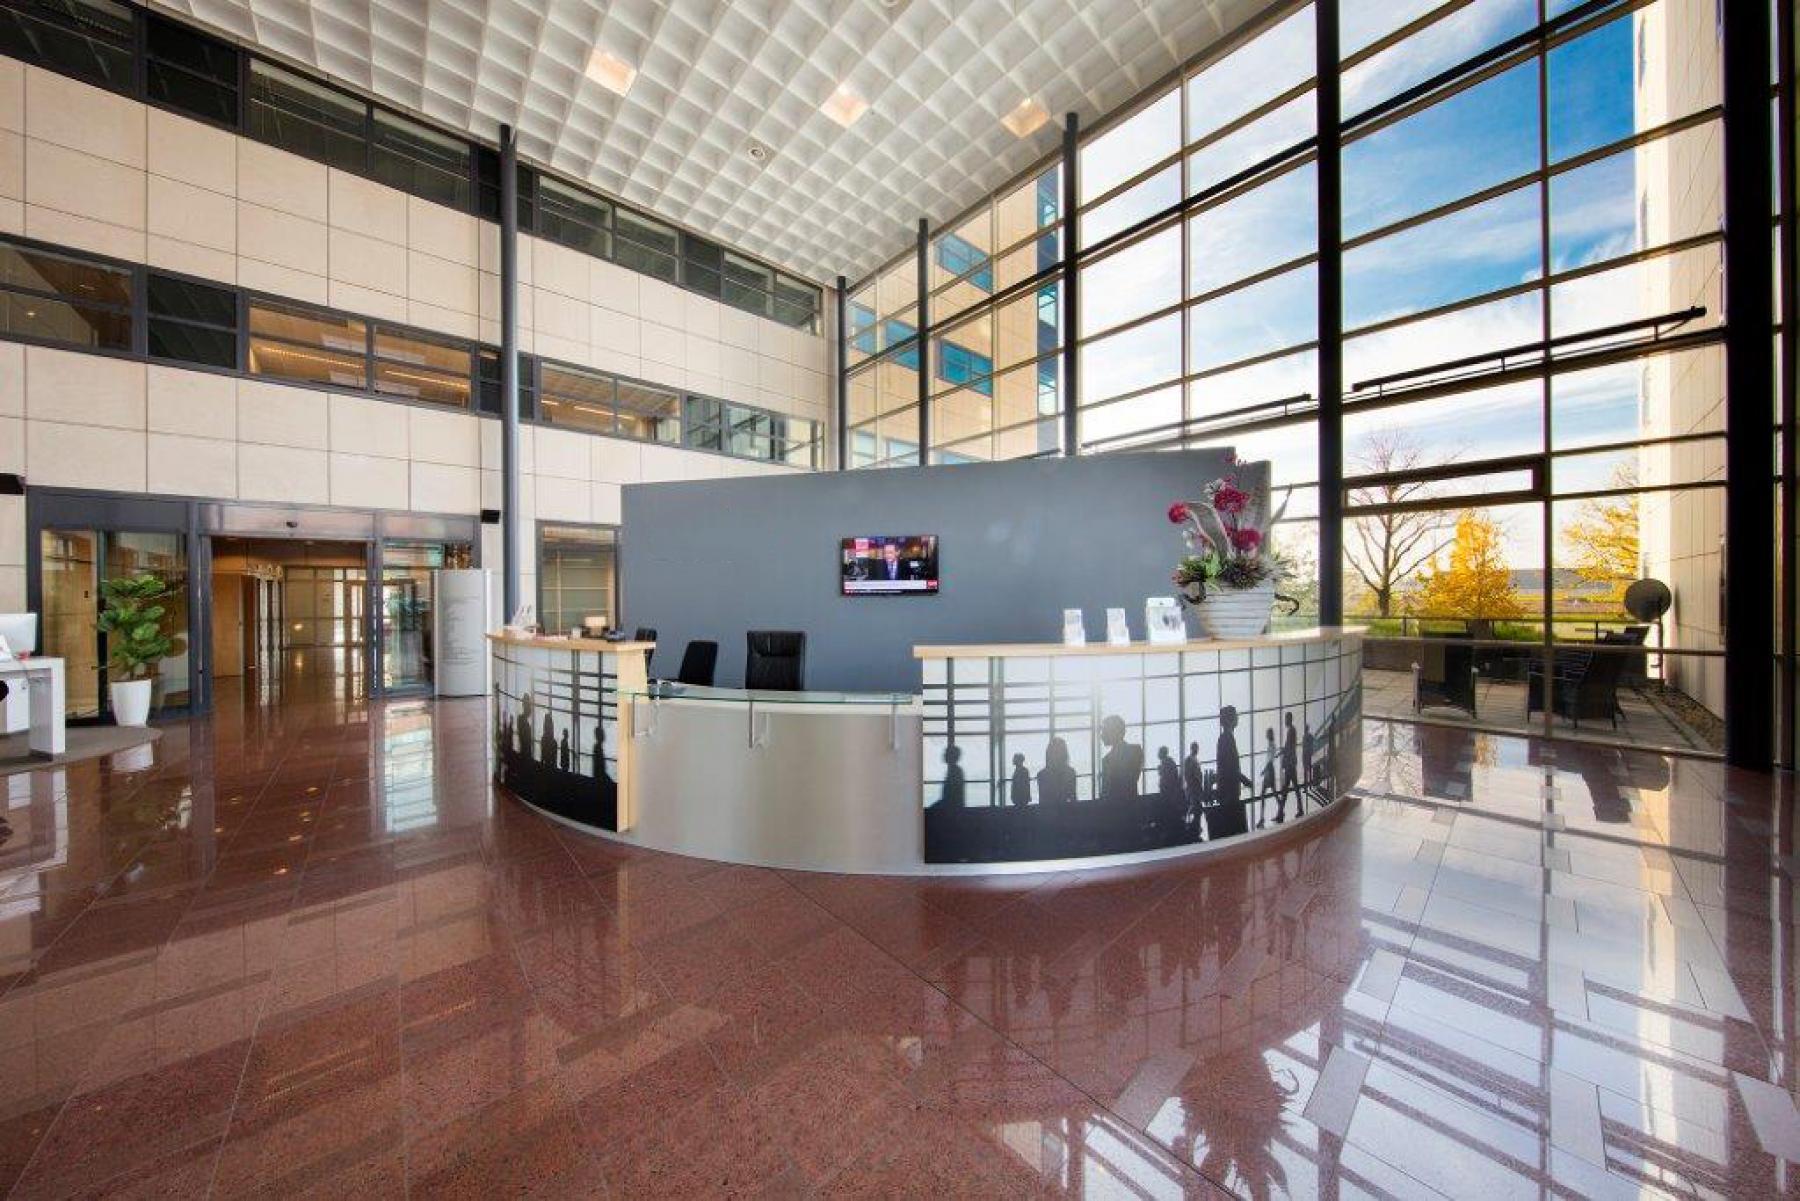 Rent office space Beechavenue 54-62, Schiphol (27)